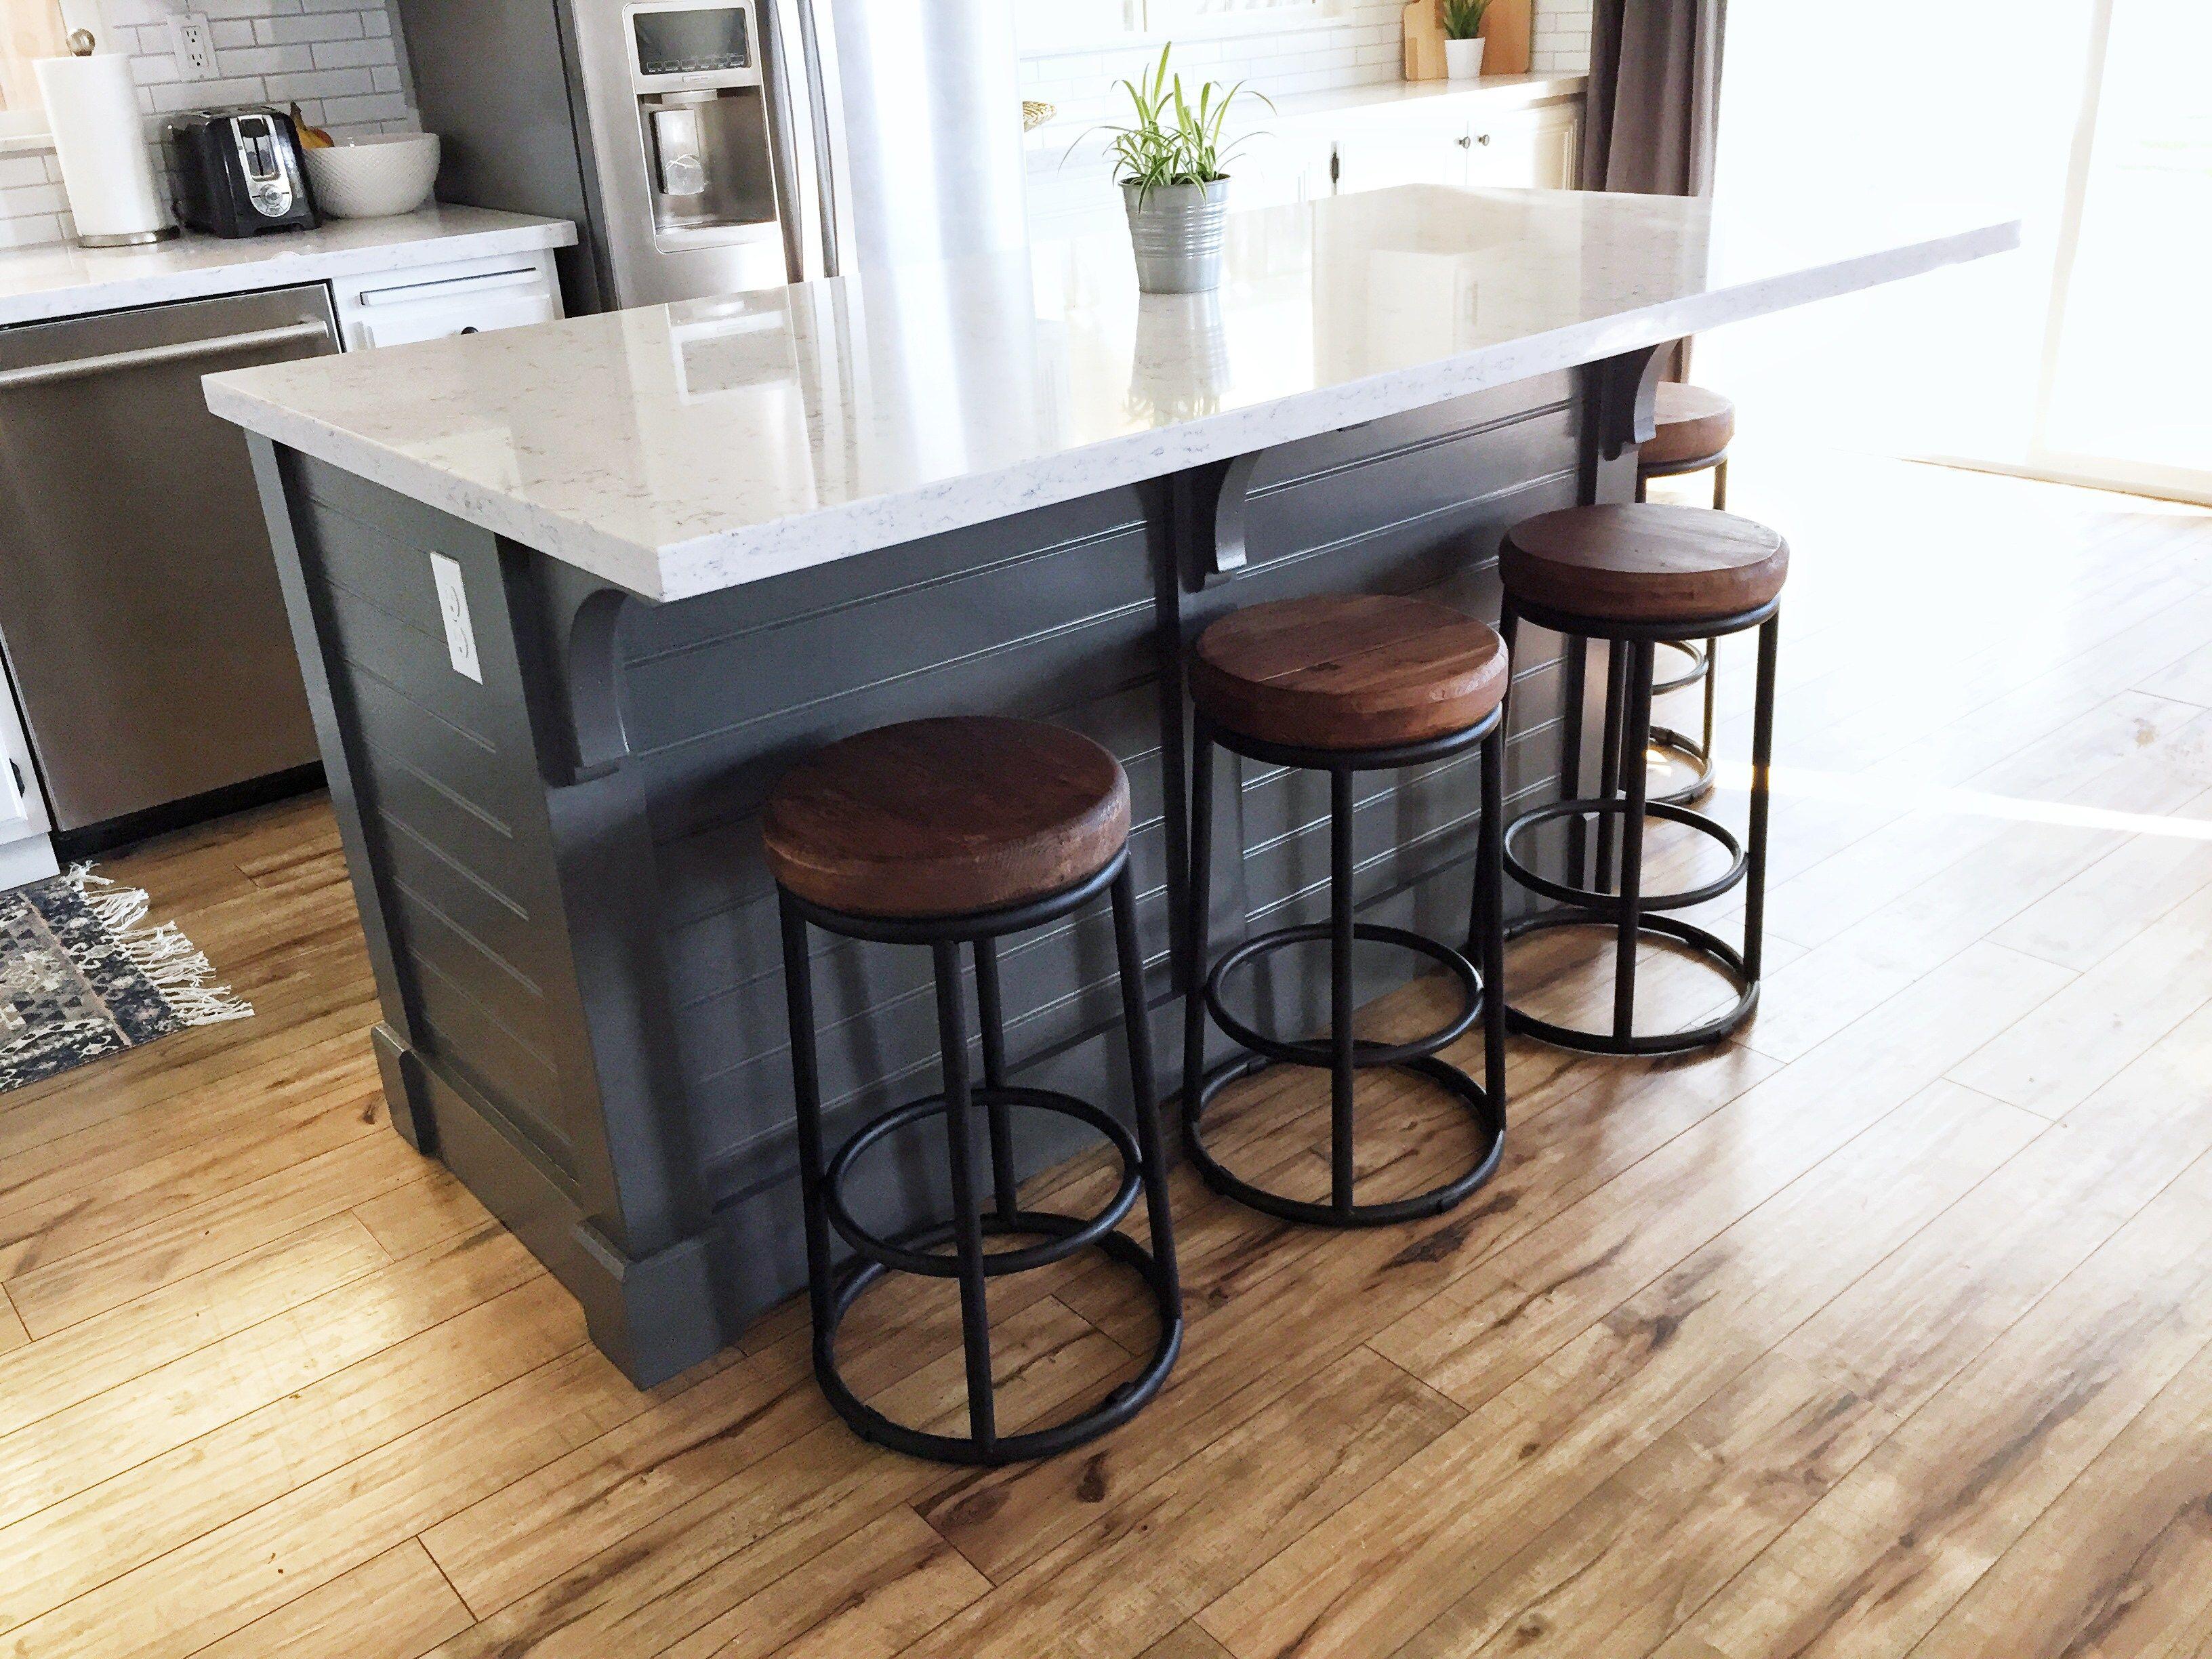 A diy kitchen island make it yourself and save big